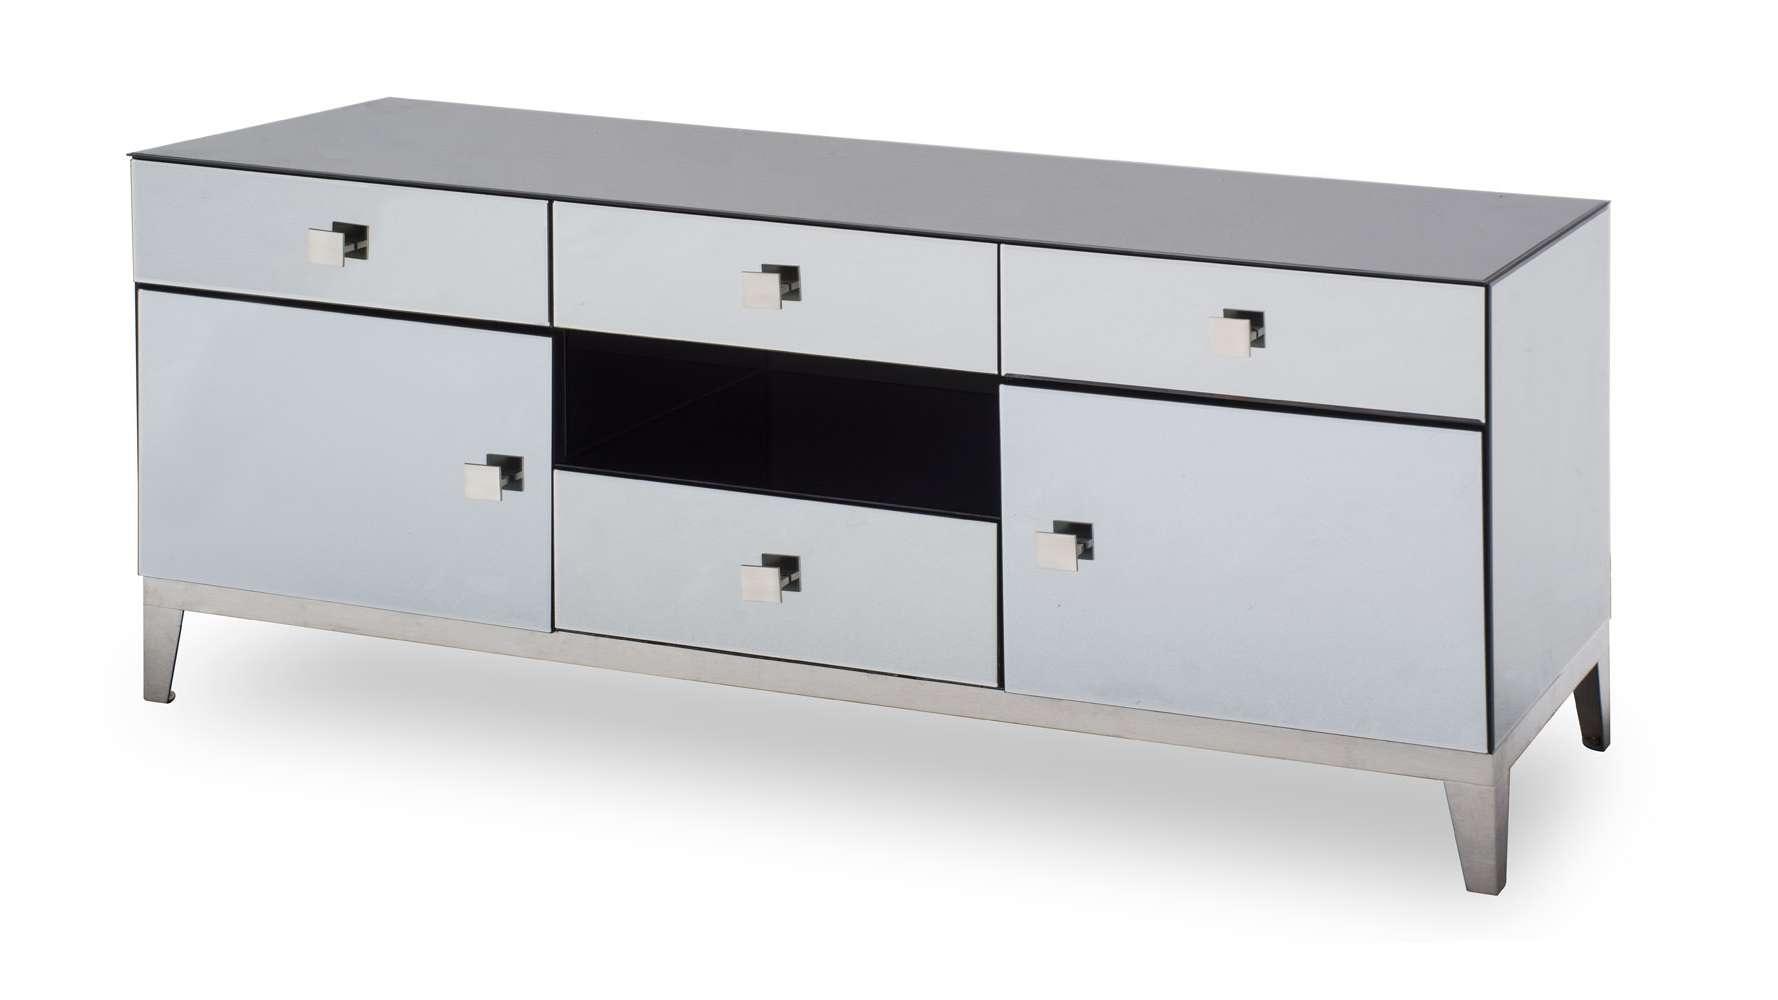 Modern Grey Mirrored Glass Berlin Tv Stand | Zuri Furniture Within Mirror Tv Cabinets (View 19 of 20)